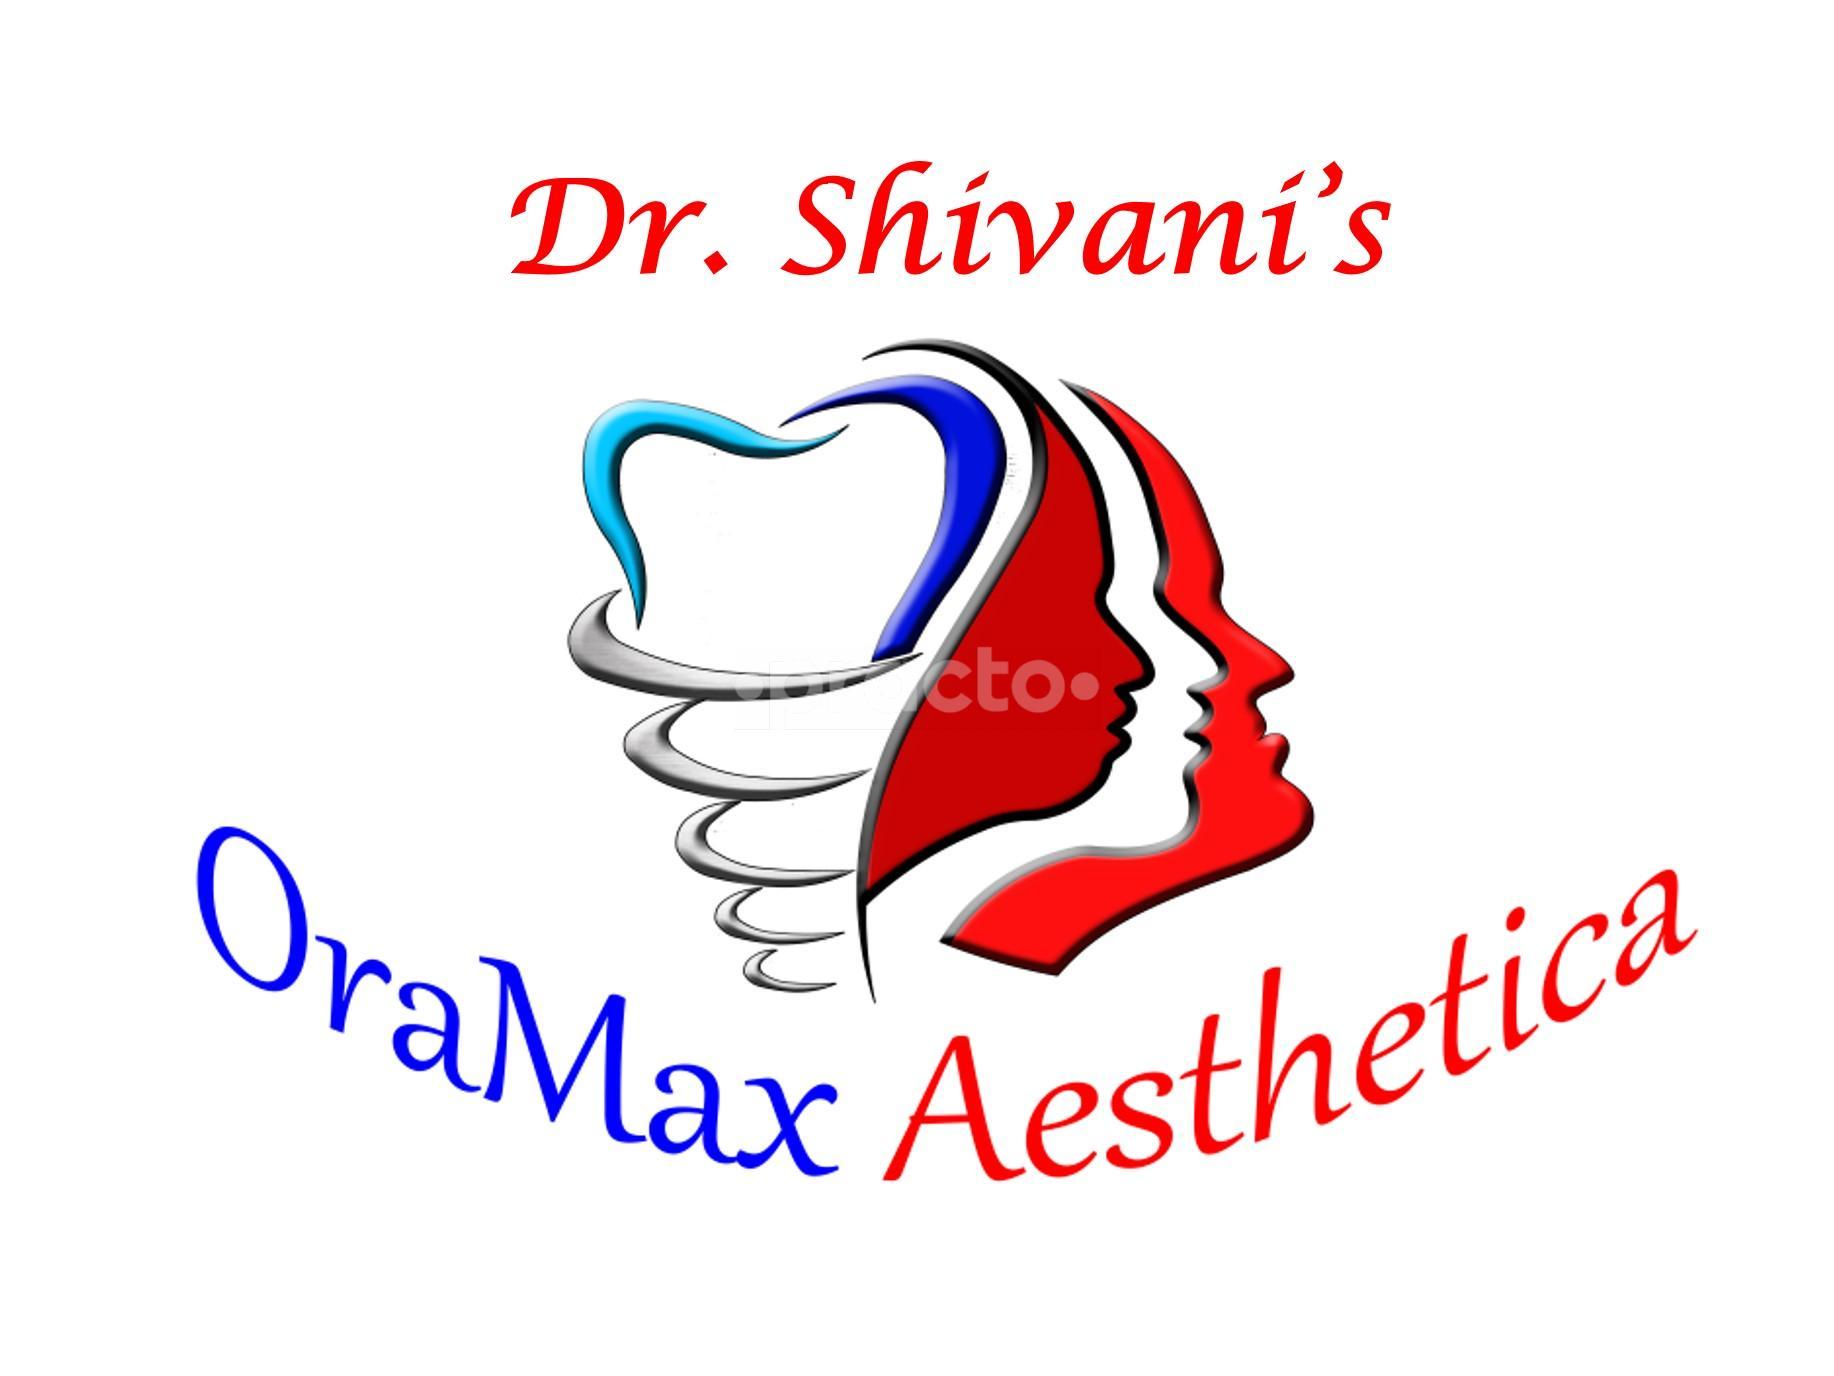 OraMax Aesthetica, Multi-Speciality Clinic in Panvel, Navi Mumbai